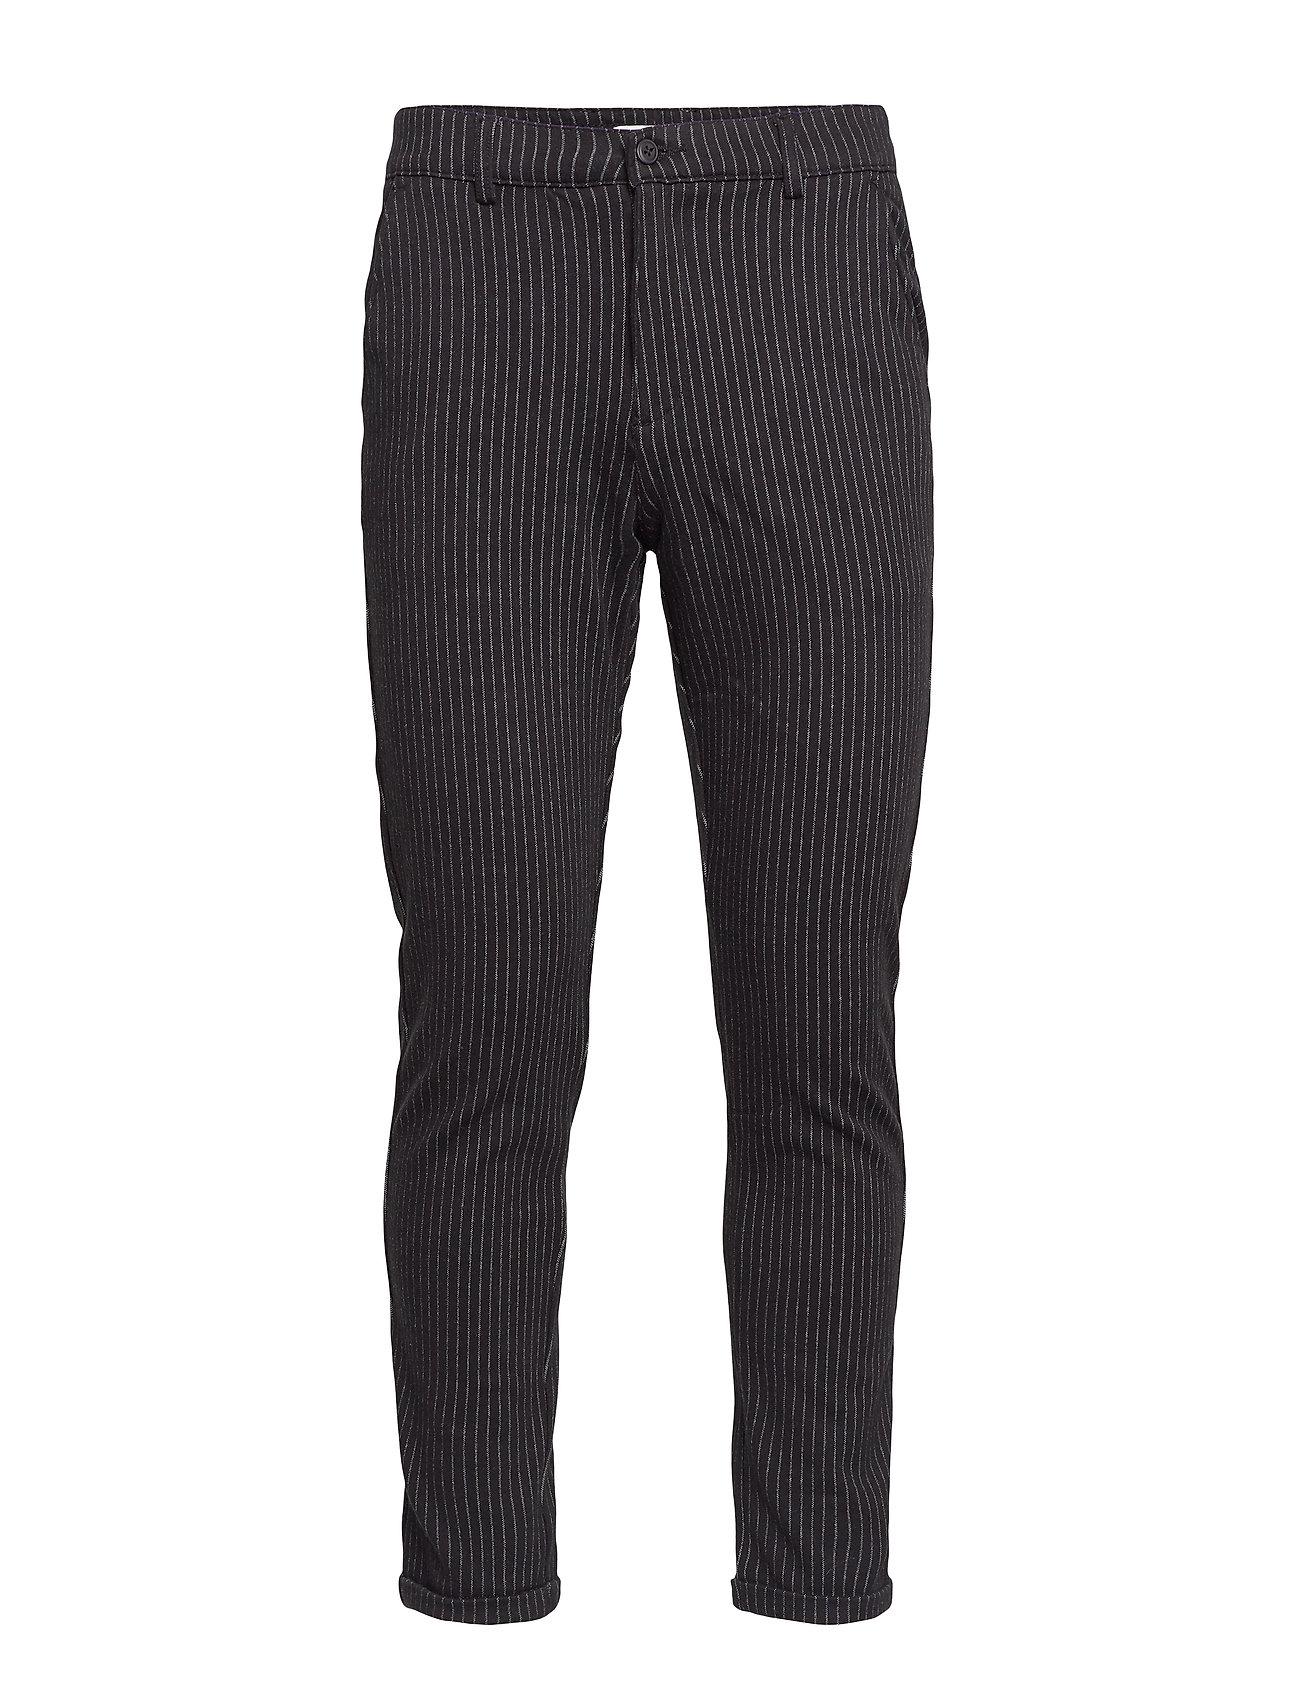 Lindbergh Chino pants with elastic waist - BLACK MIX